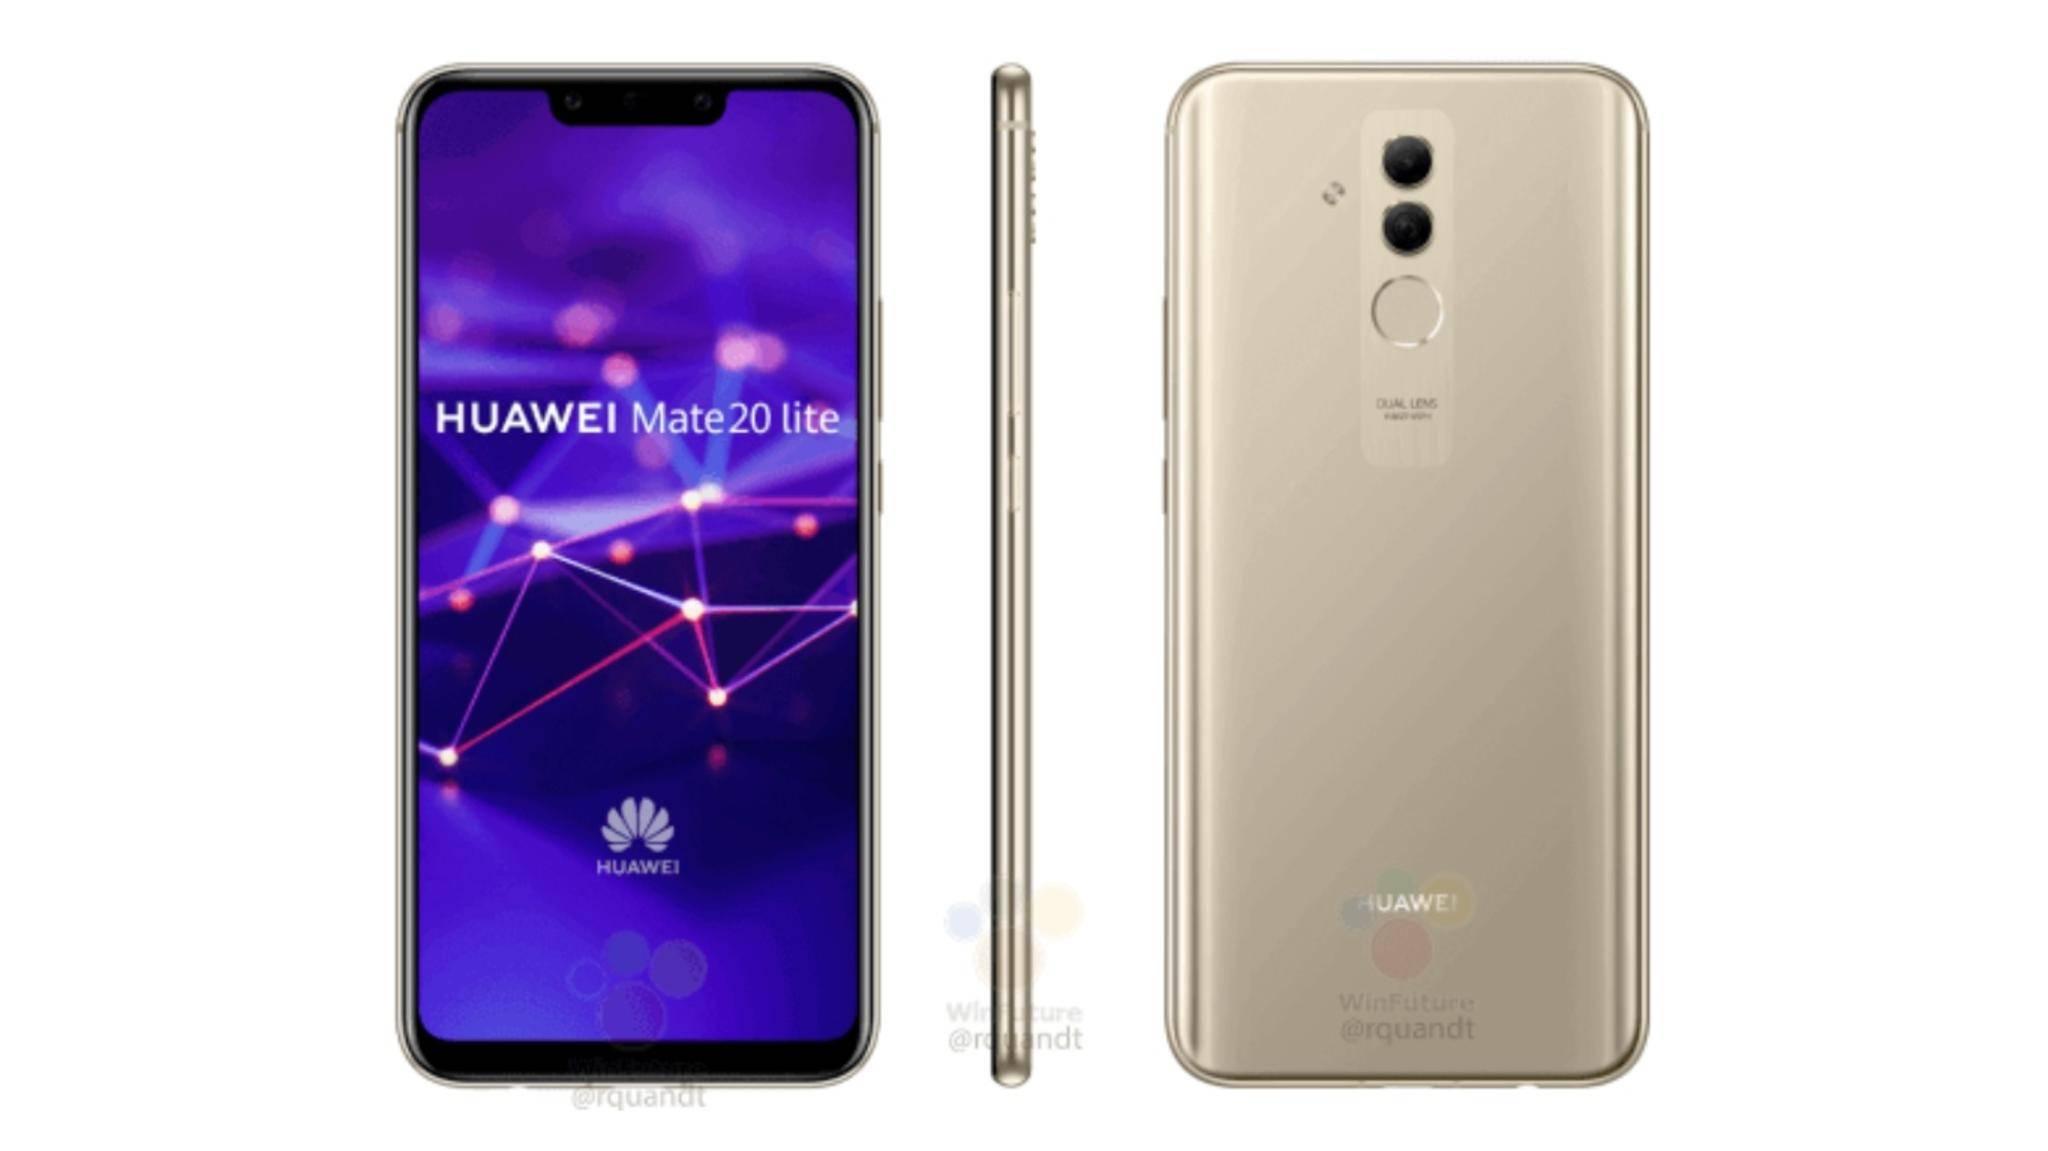 Das Huawei P20 Lite ähnelt technisch dem Huawei P Smart Plus.